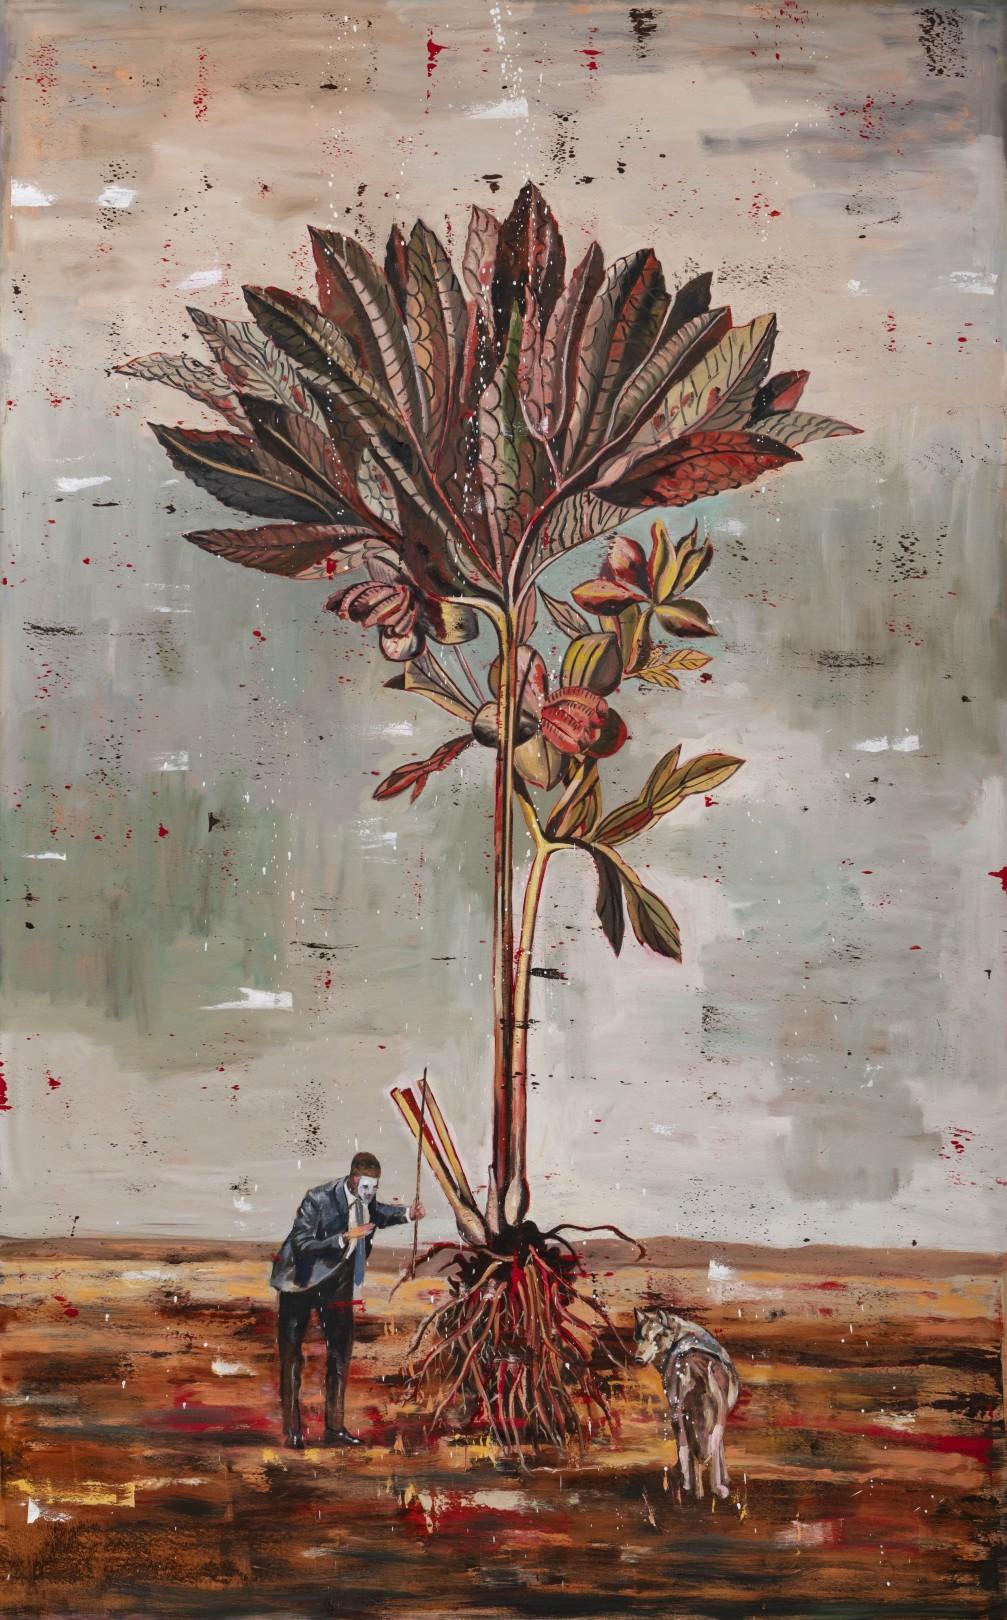 Nicky Nodjoumi Environmental Series - Helleborus Purourascene, 2019 Oil on canvas 235 x 152 cm. / 96 x 60 in.